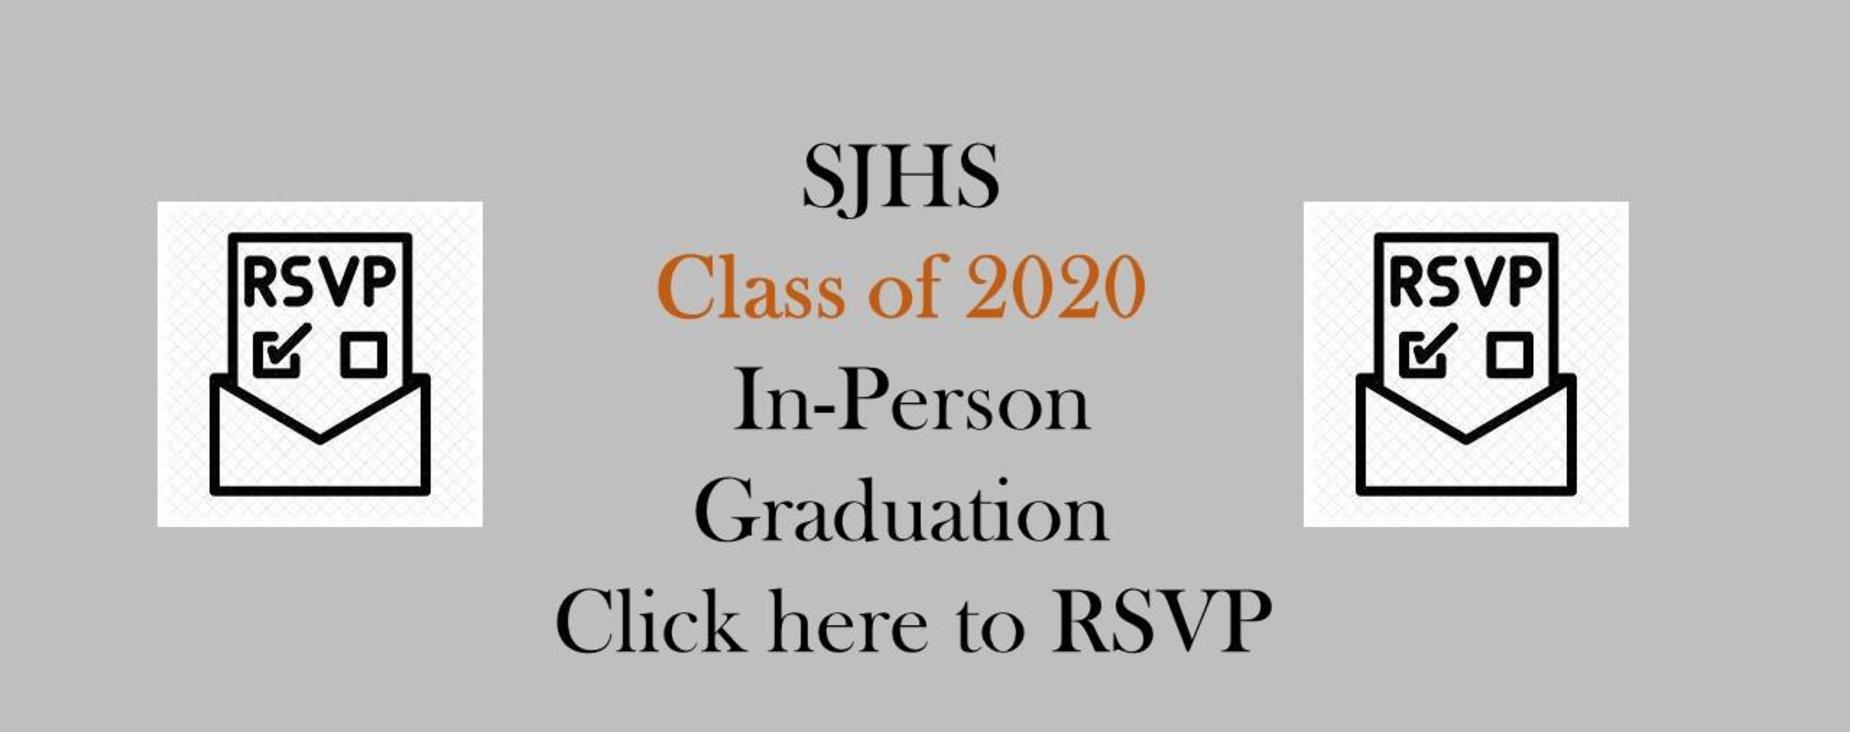 Class of 2020 RSVP